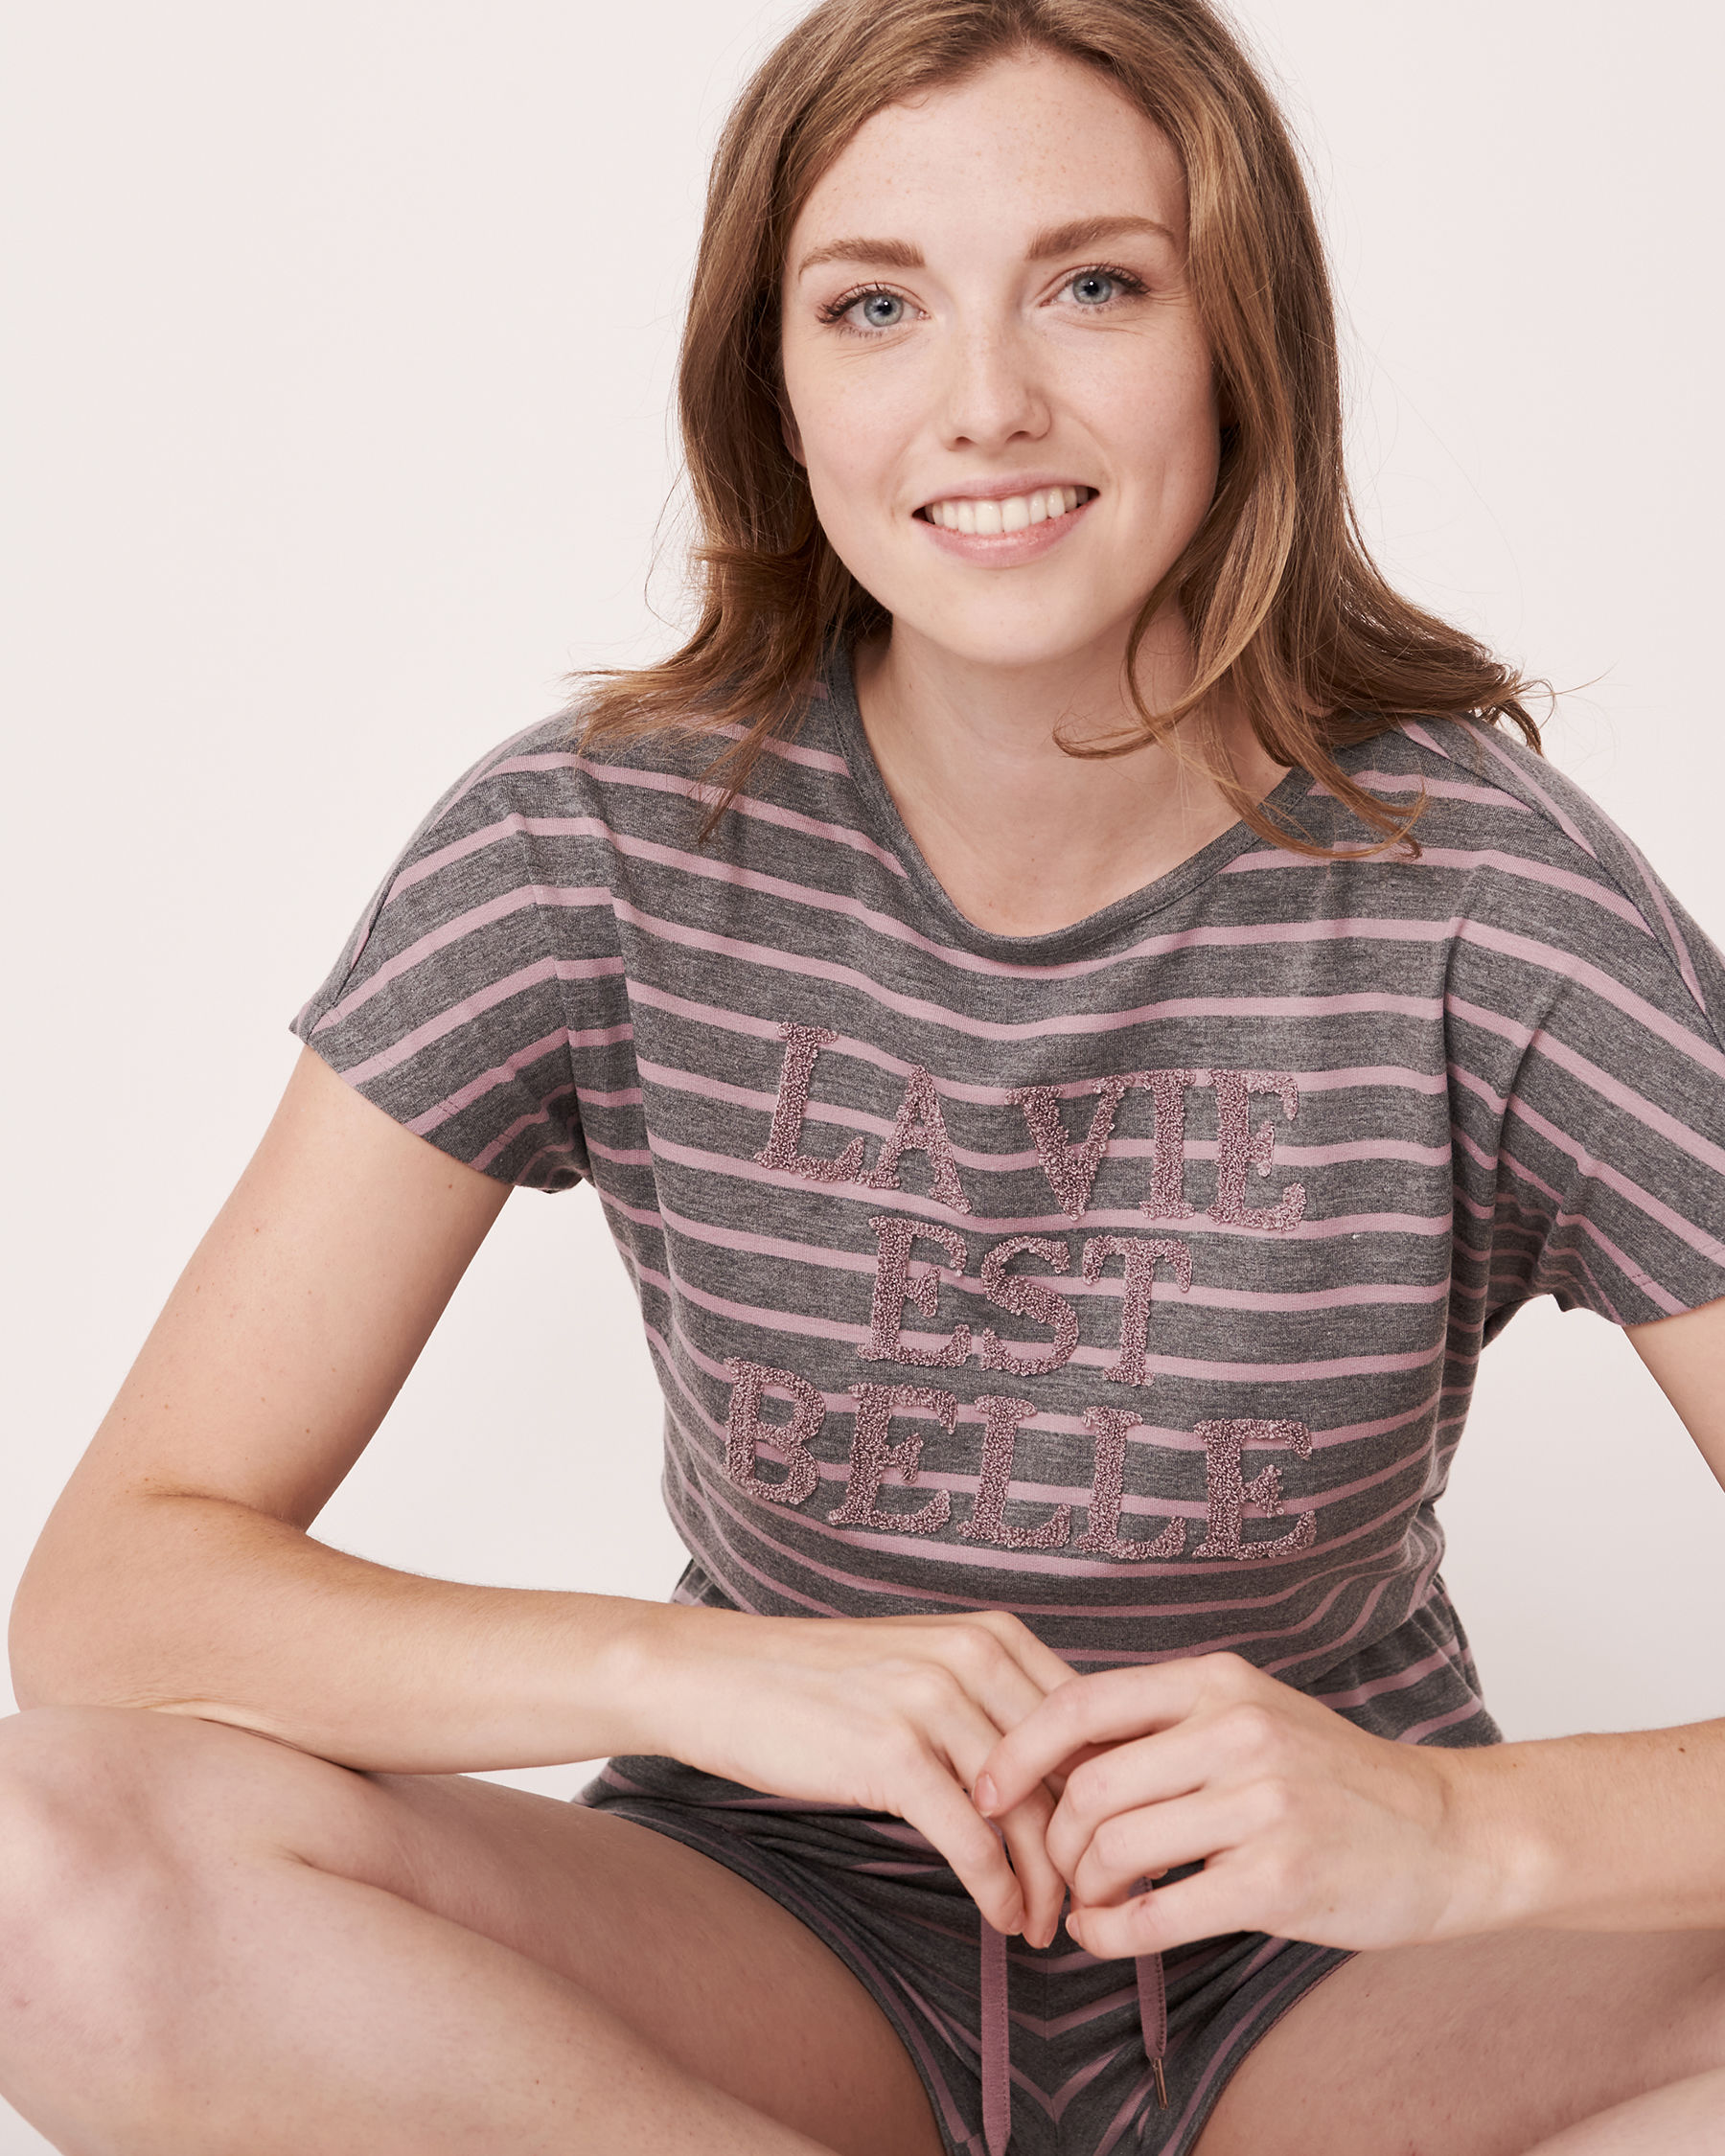 LA VIE EN ROSE Striped Romper Grey and pink mix 768-374-1-11 - View1